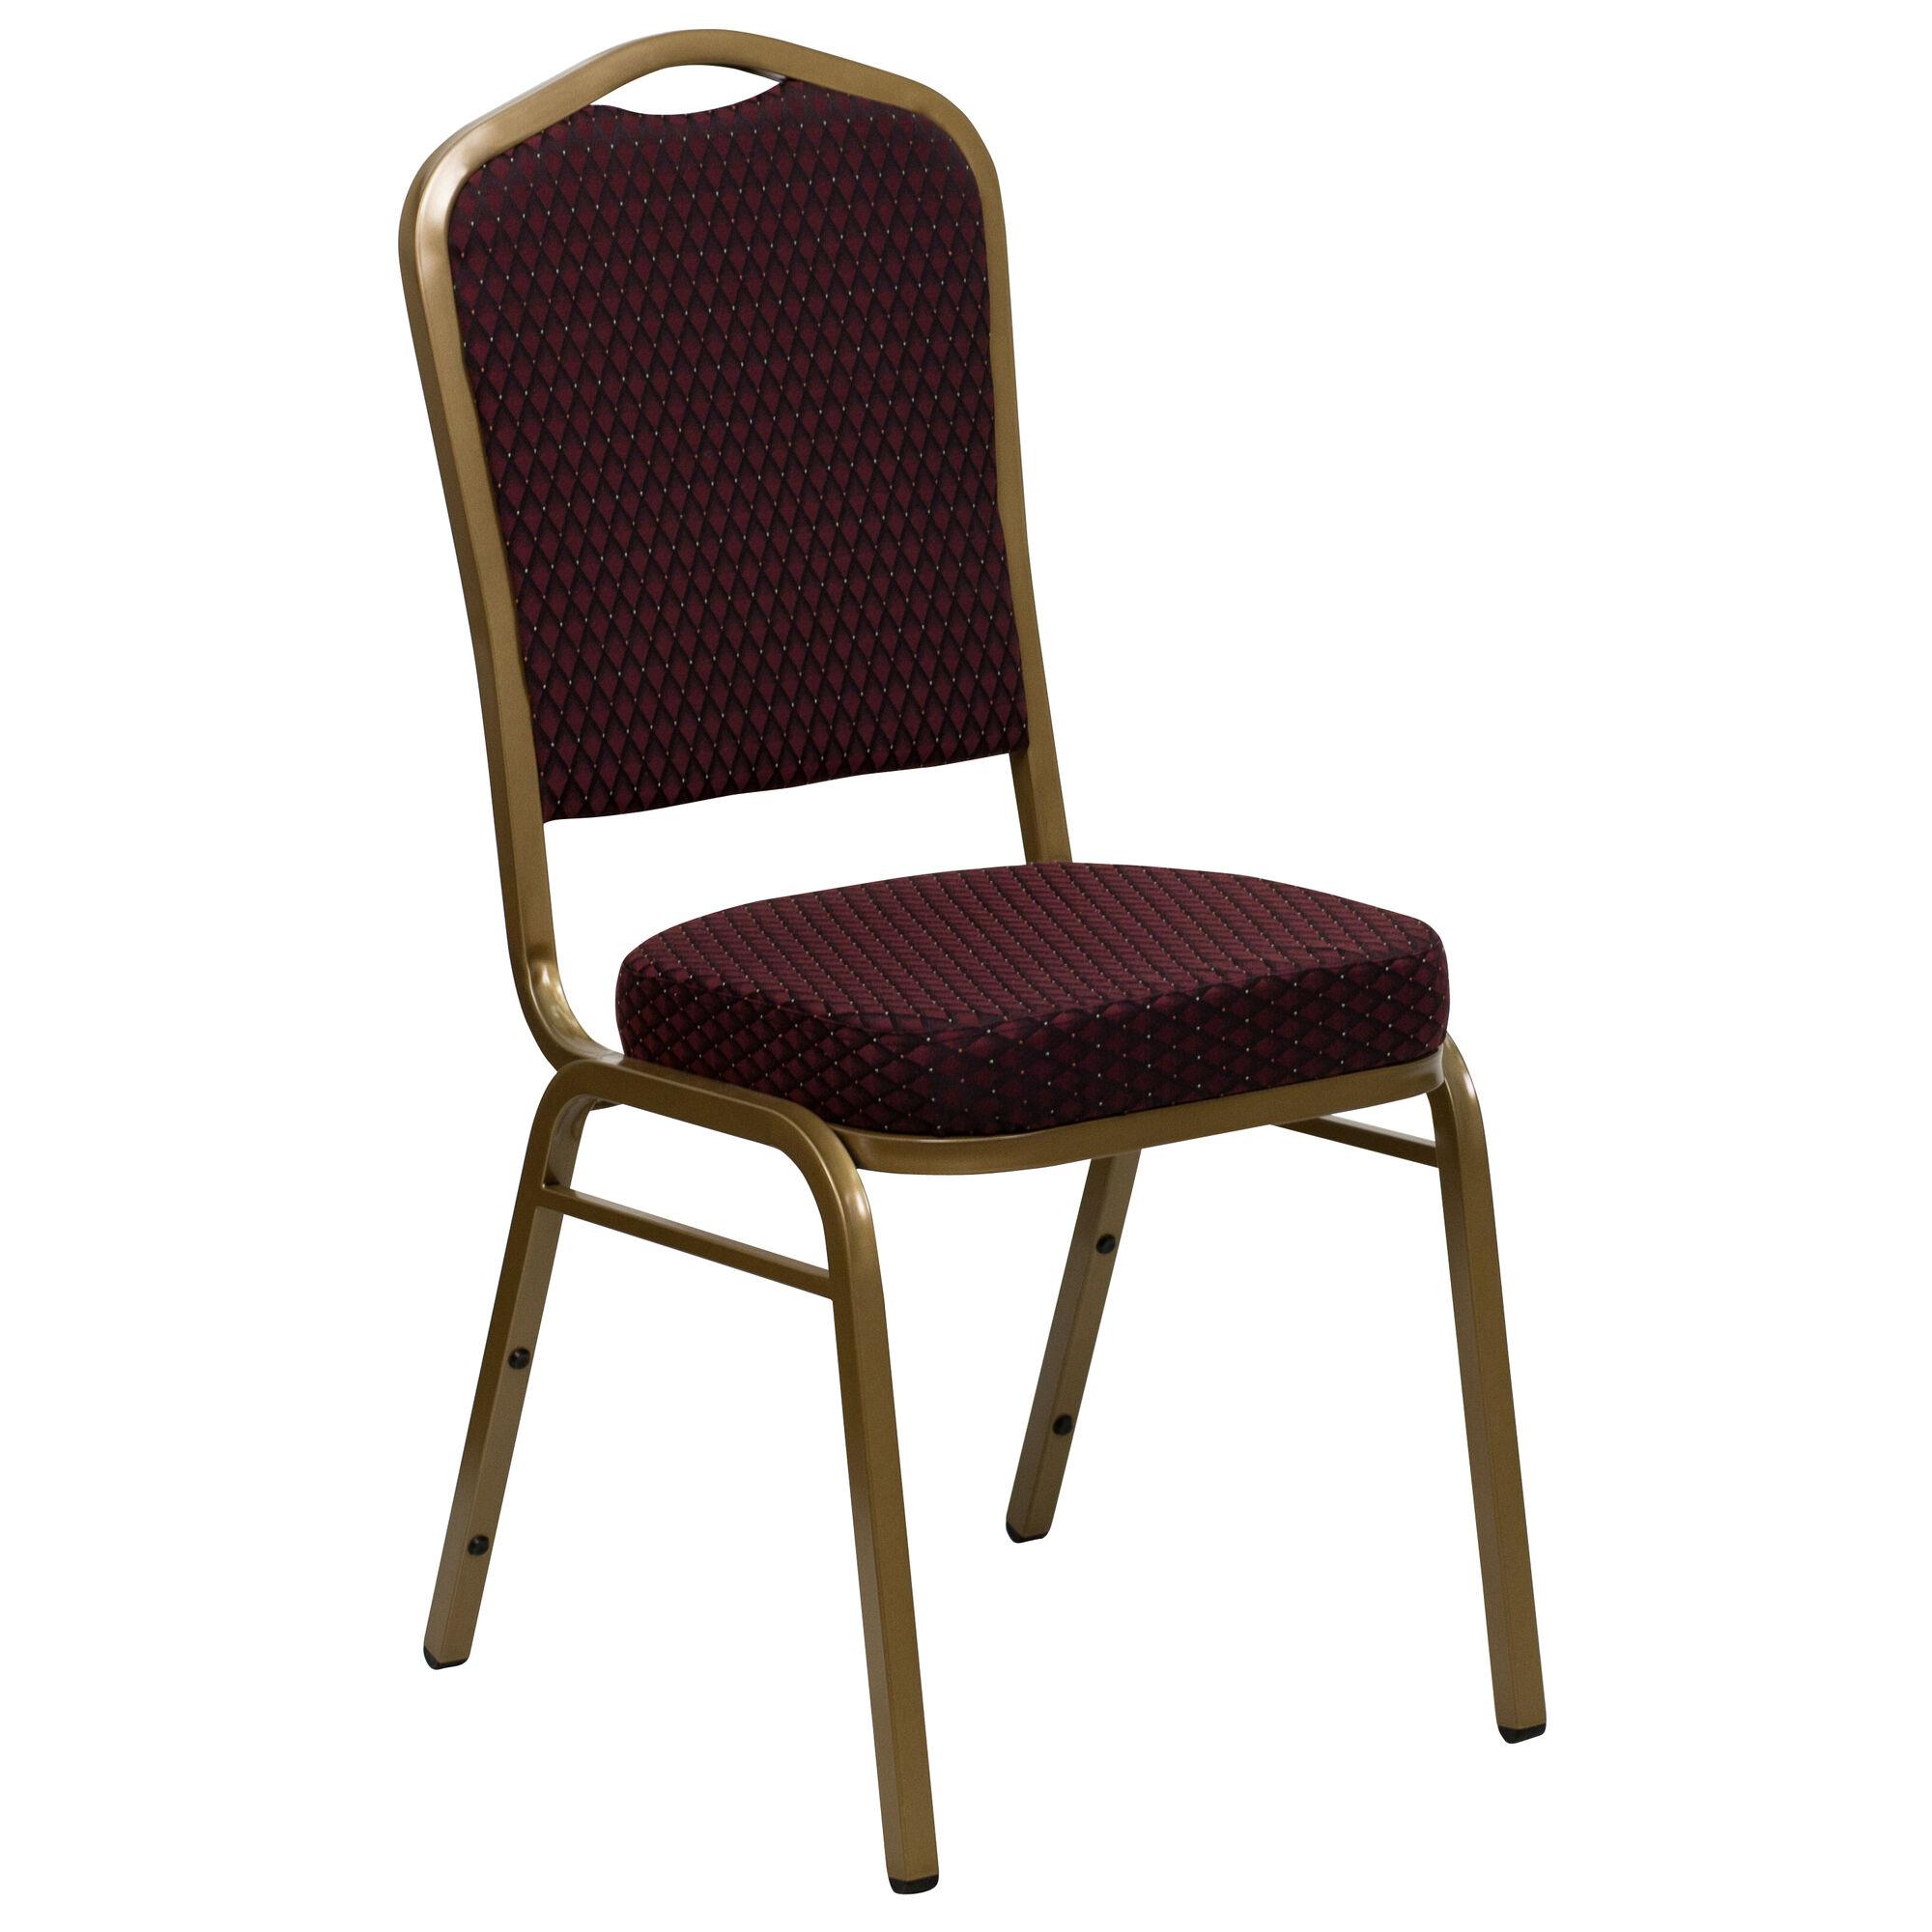 Burgundy Fabric Banquet Chair FD C01 ALLGOLD EFE1679 GG